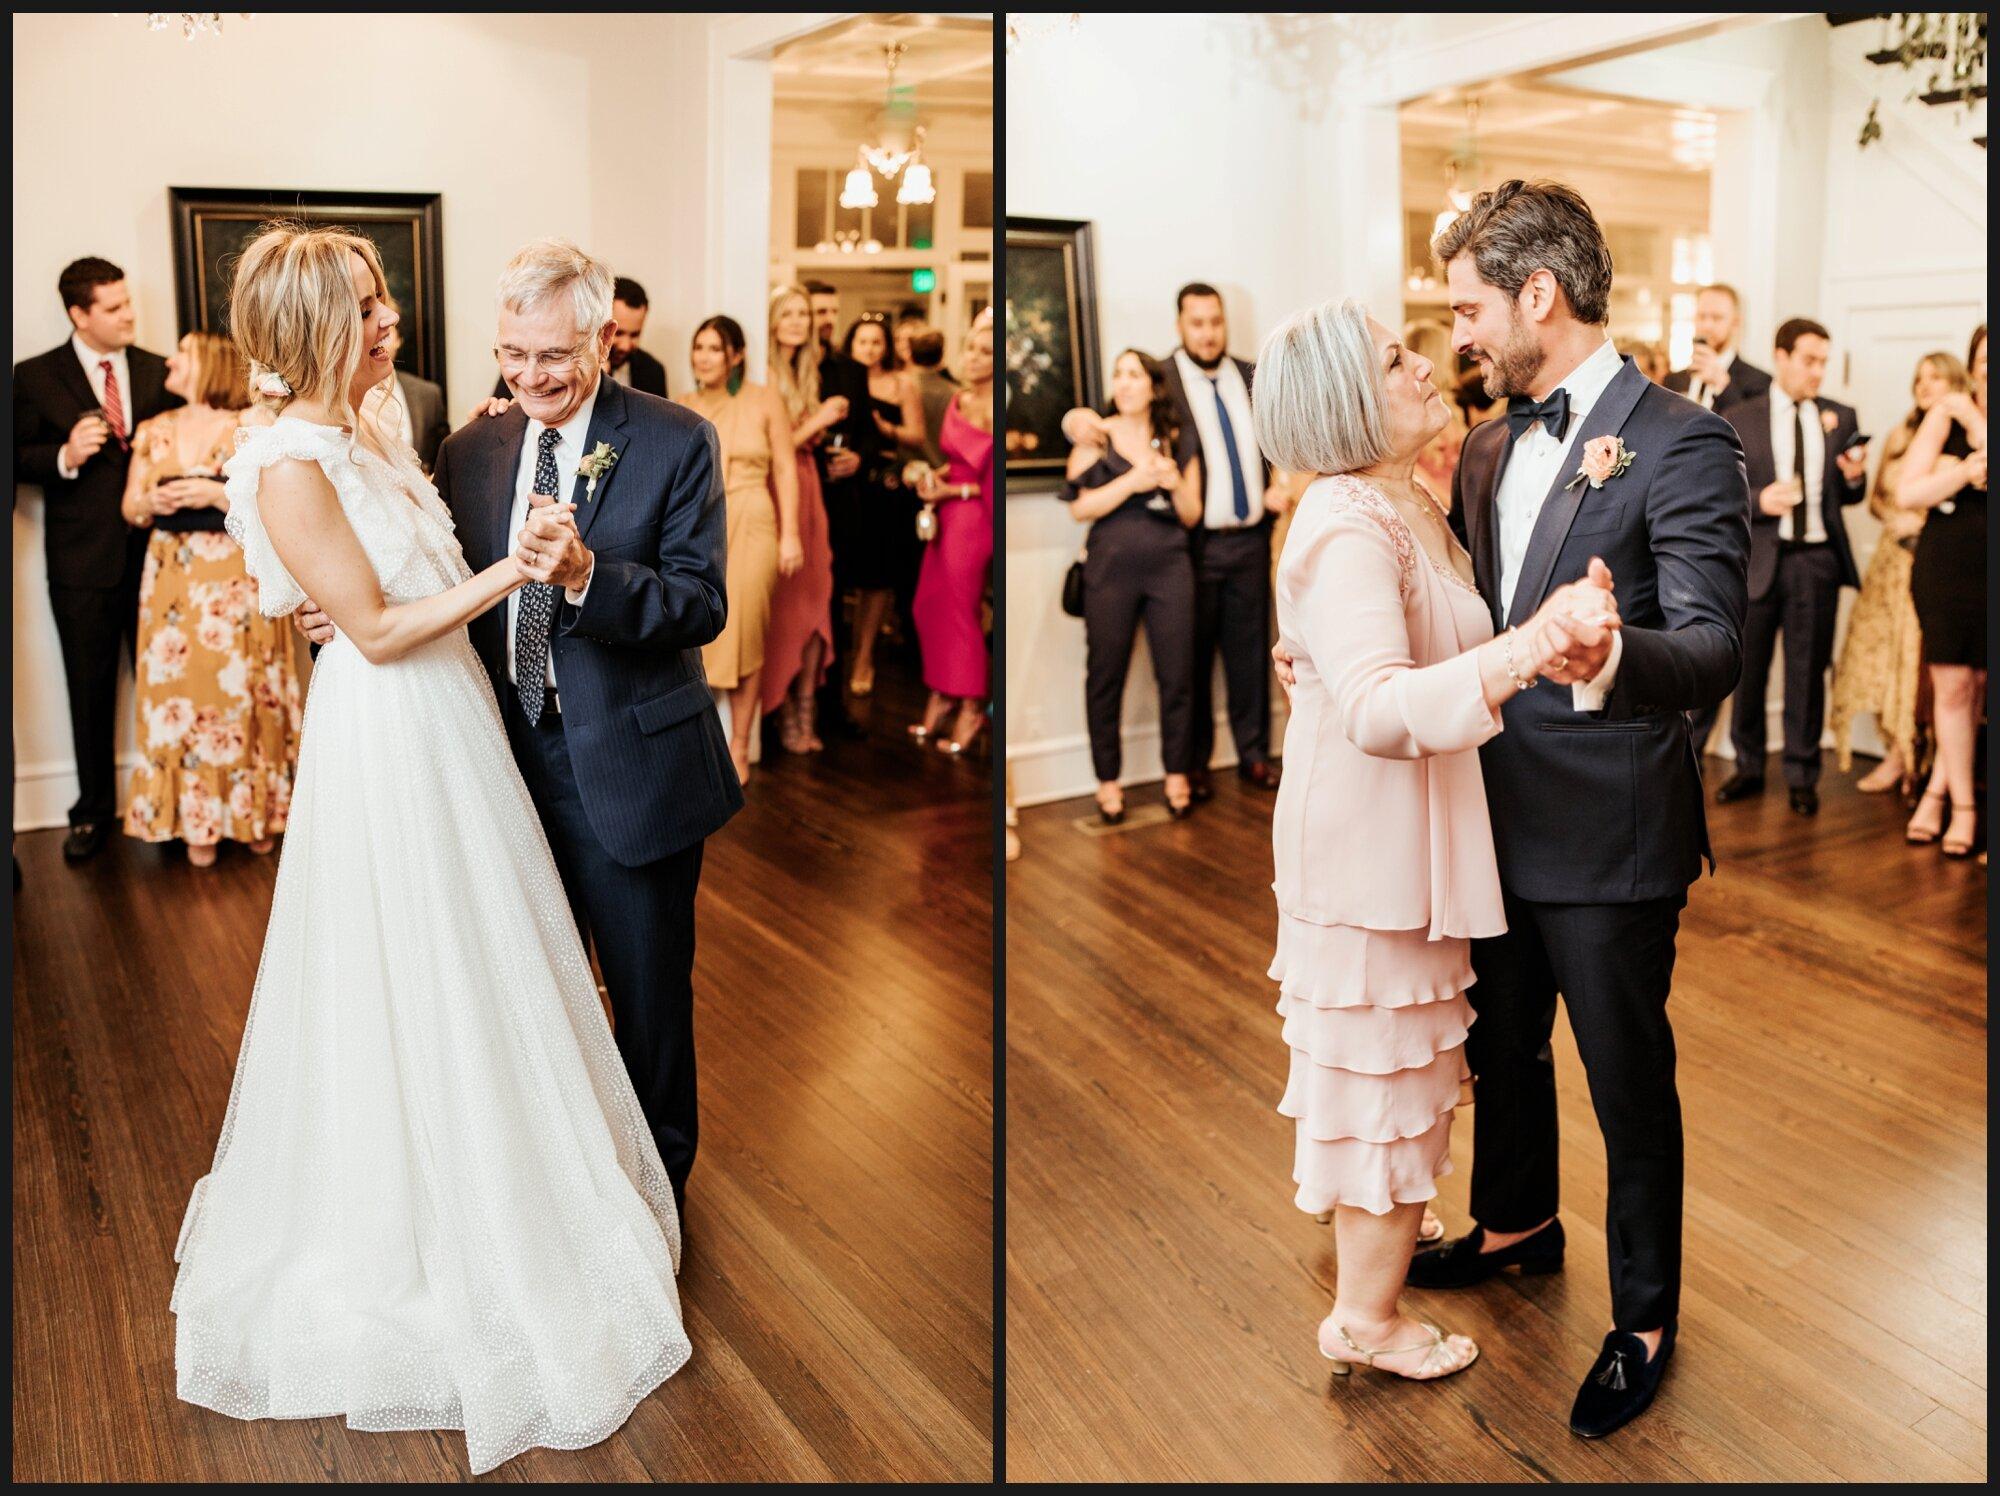 Orlando-Wedding-Photographer-destination-wedding-photographer-florida-wedding-photographer-hawaii-wedding-photographer_0715.jpg